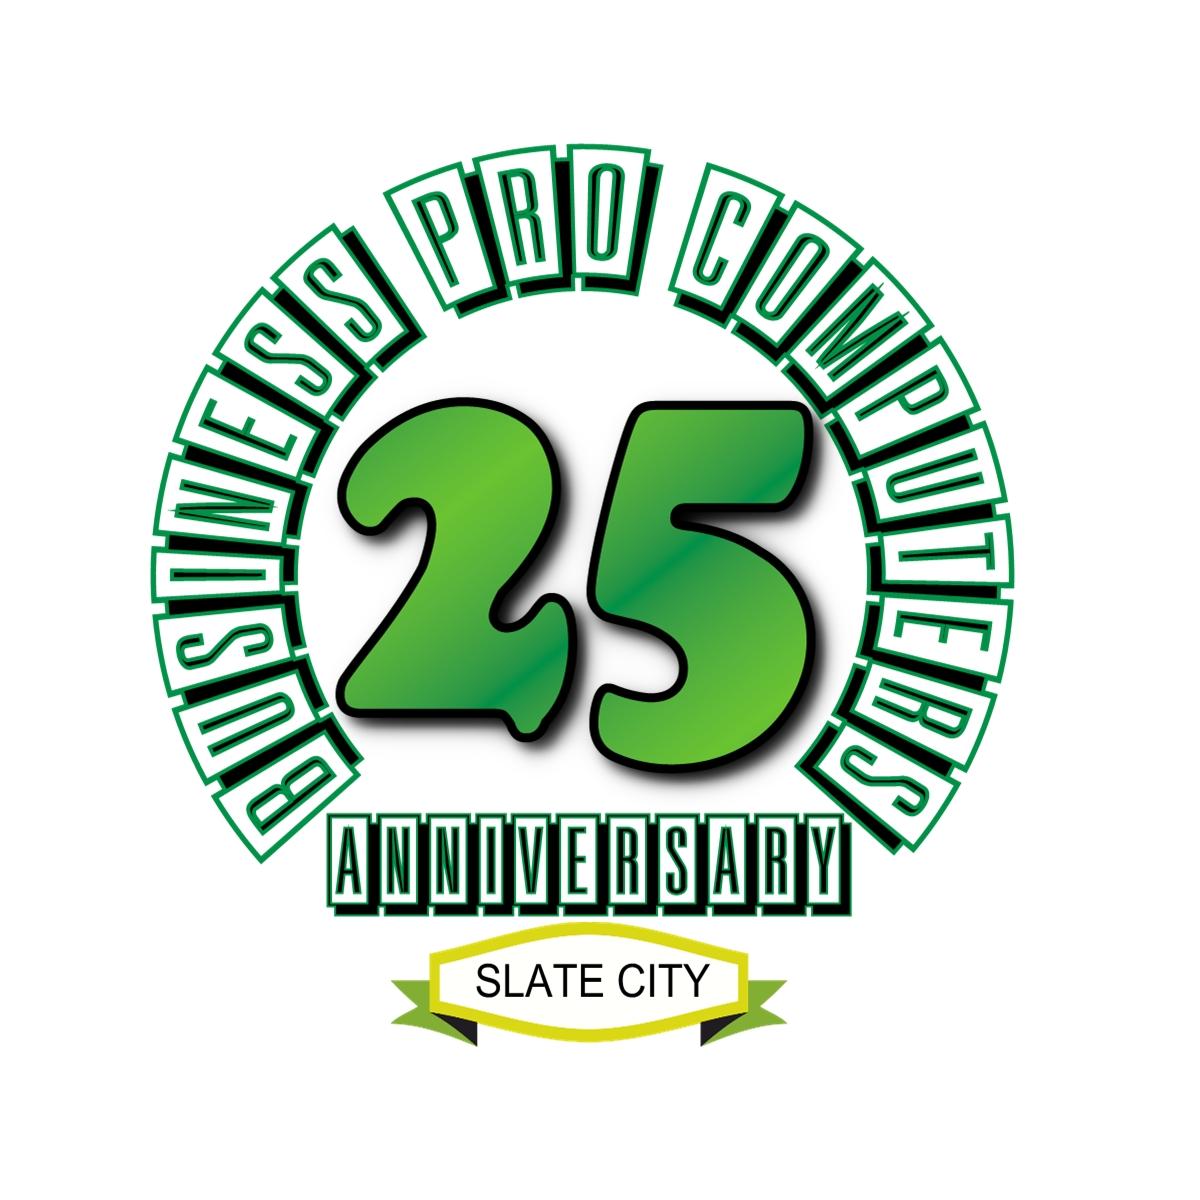 Logo Design by Joseph calunsag Cagaanan - Entry No. 119 in the Logo Design Contest 25th Anniversary Logo Contest.